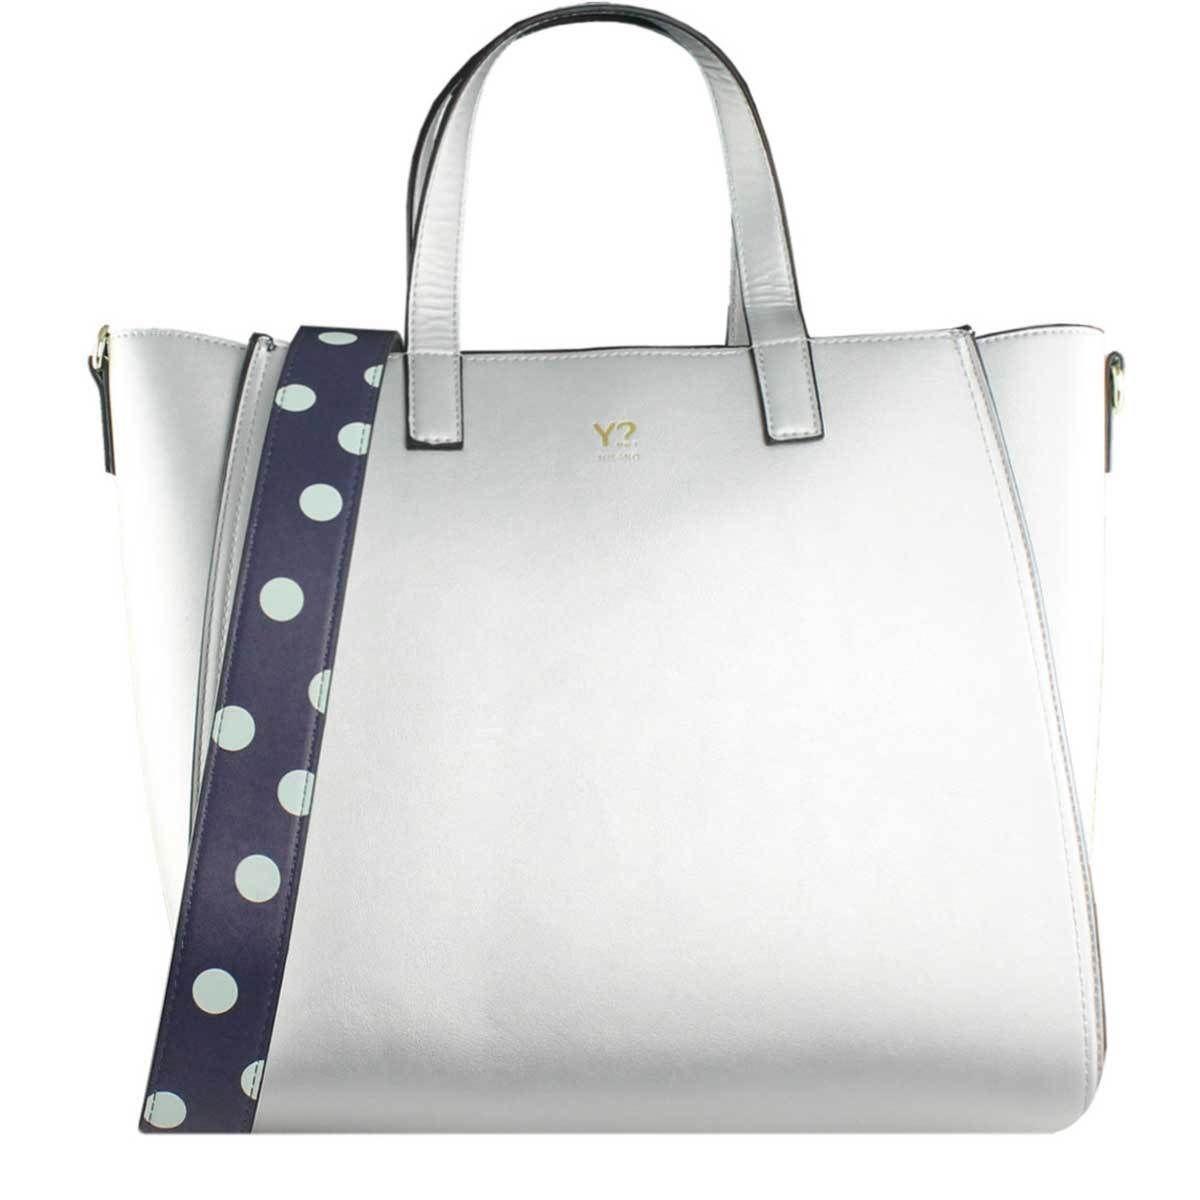 borsa donna shopping grande Y not Breeze Silver nuova